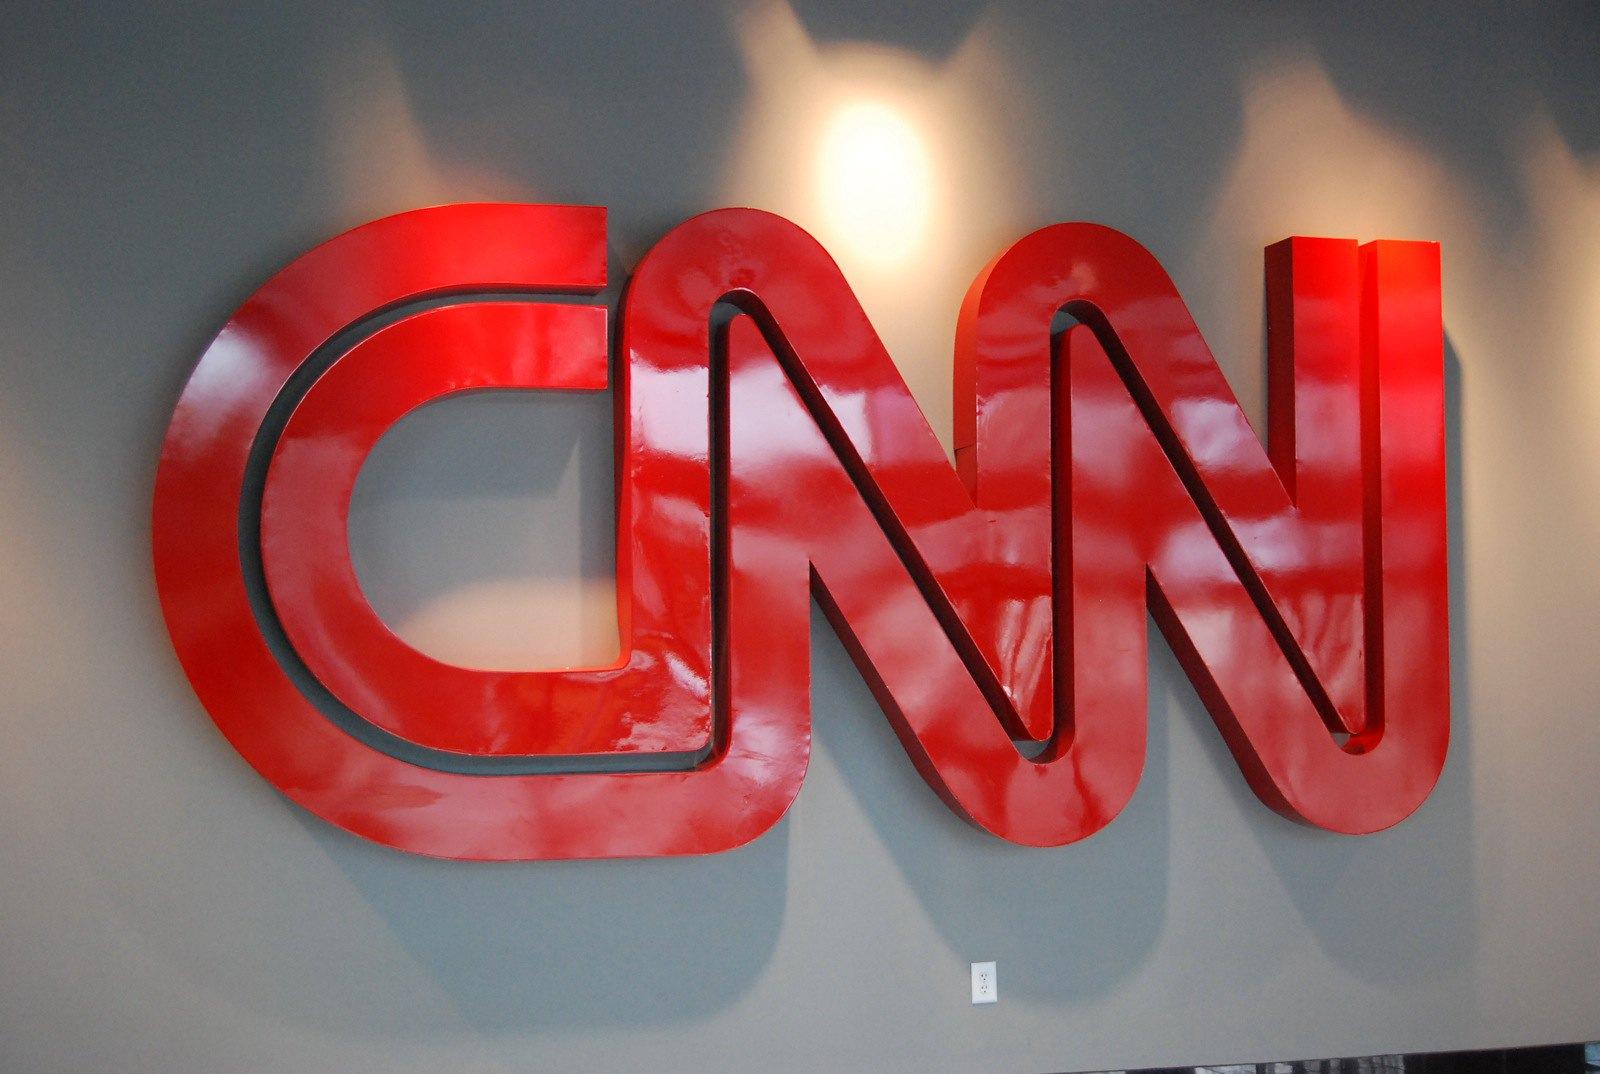 CNN เลิกจ้างพนักงาน เหตุเข้าสำนักงานโดยยังไม่ฉีดวัคซีน COVID-19